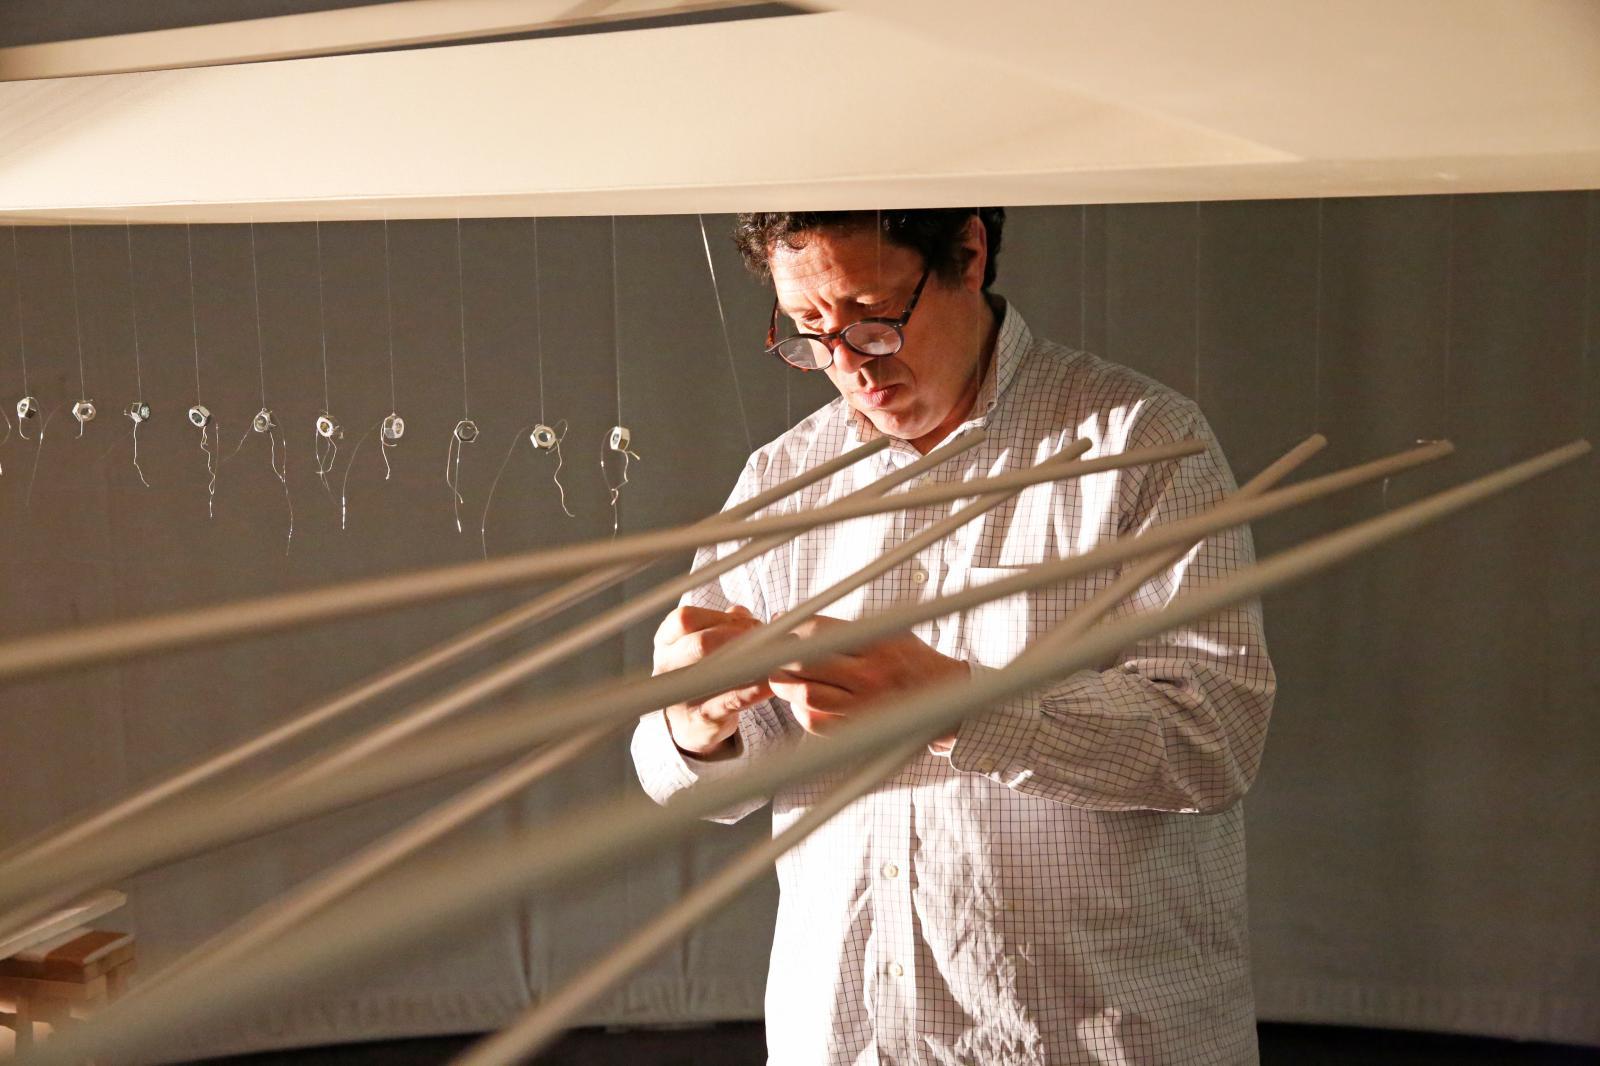 L'artiste dans son atelier. ©Michel Lunardelli